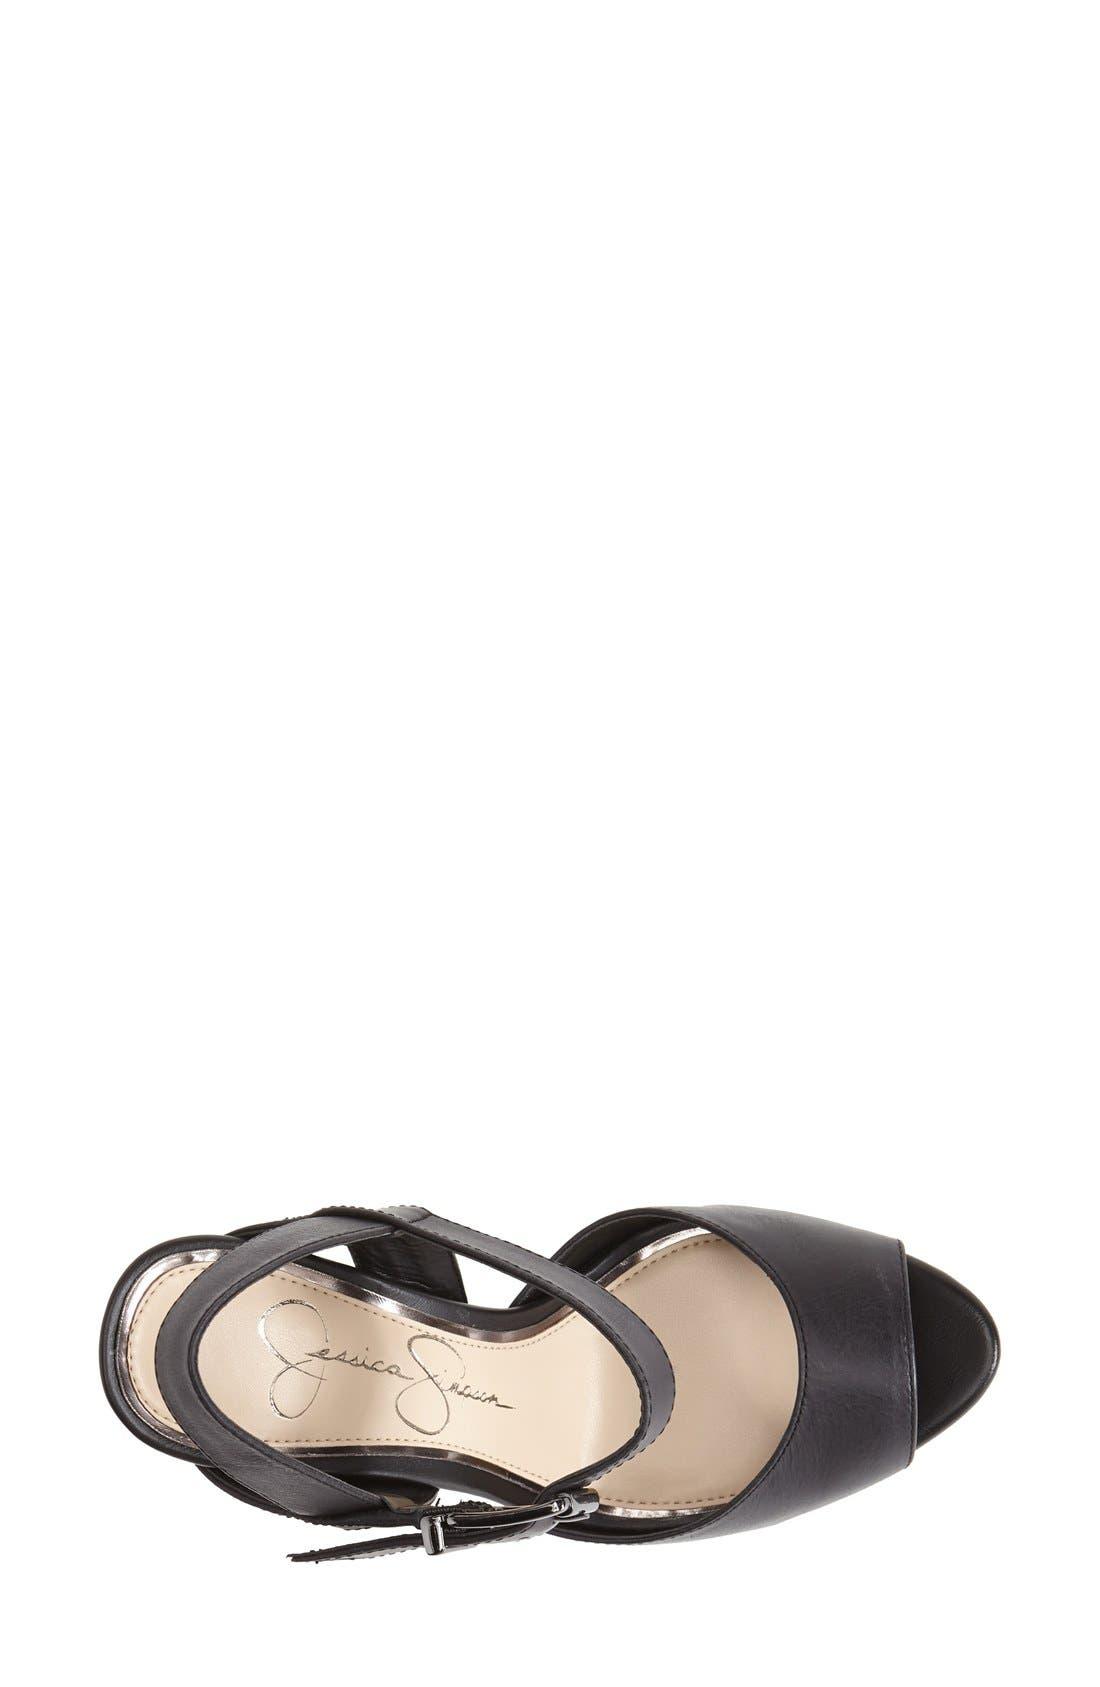 Alternate Image 3  - Jessica Simpson 'Daelyn' Studded Leather Platform Sandal (Women)